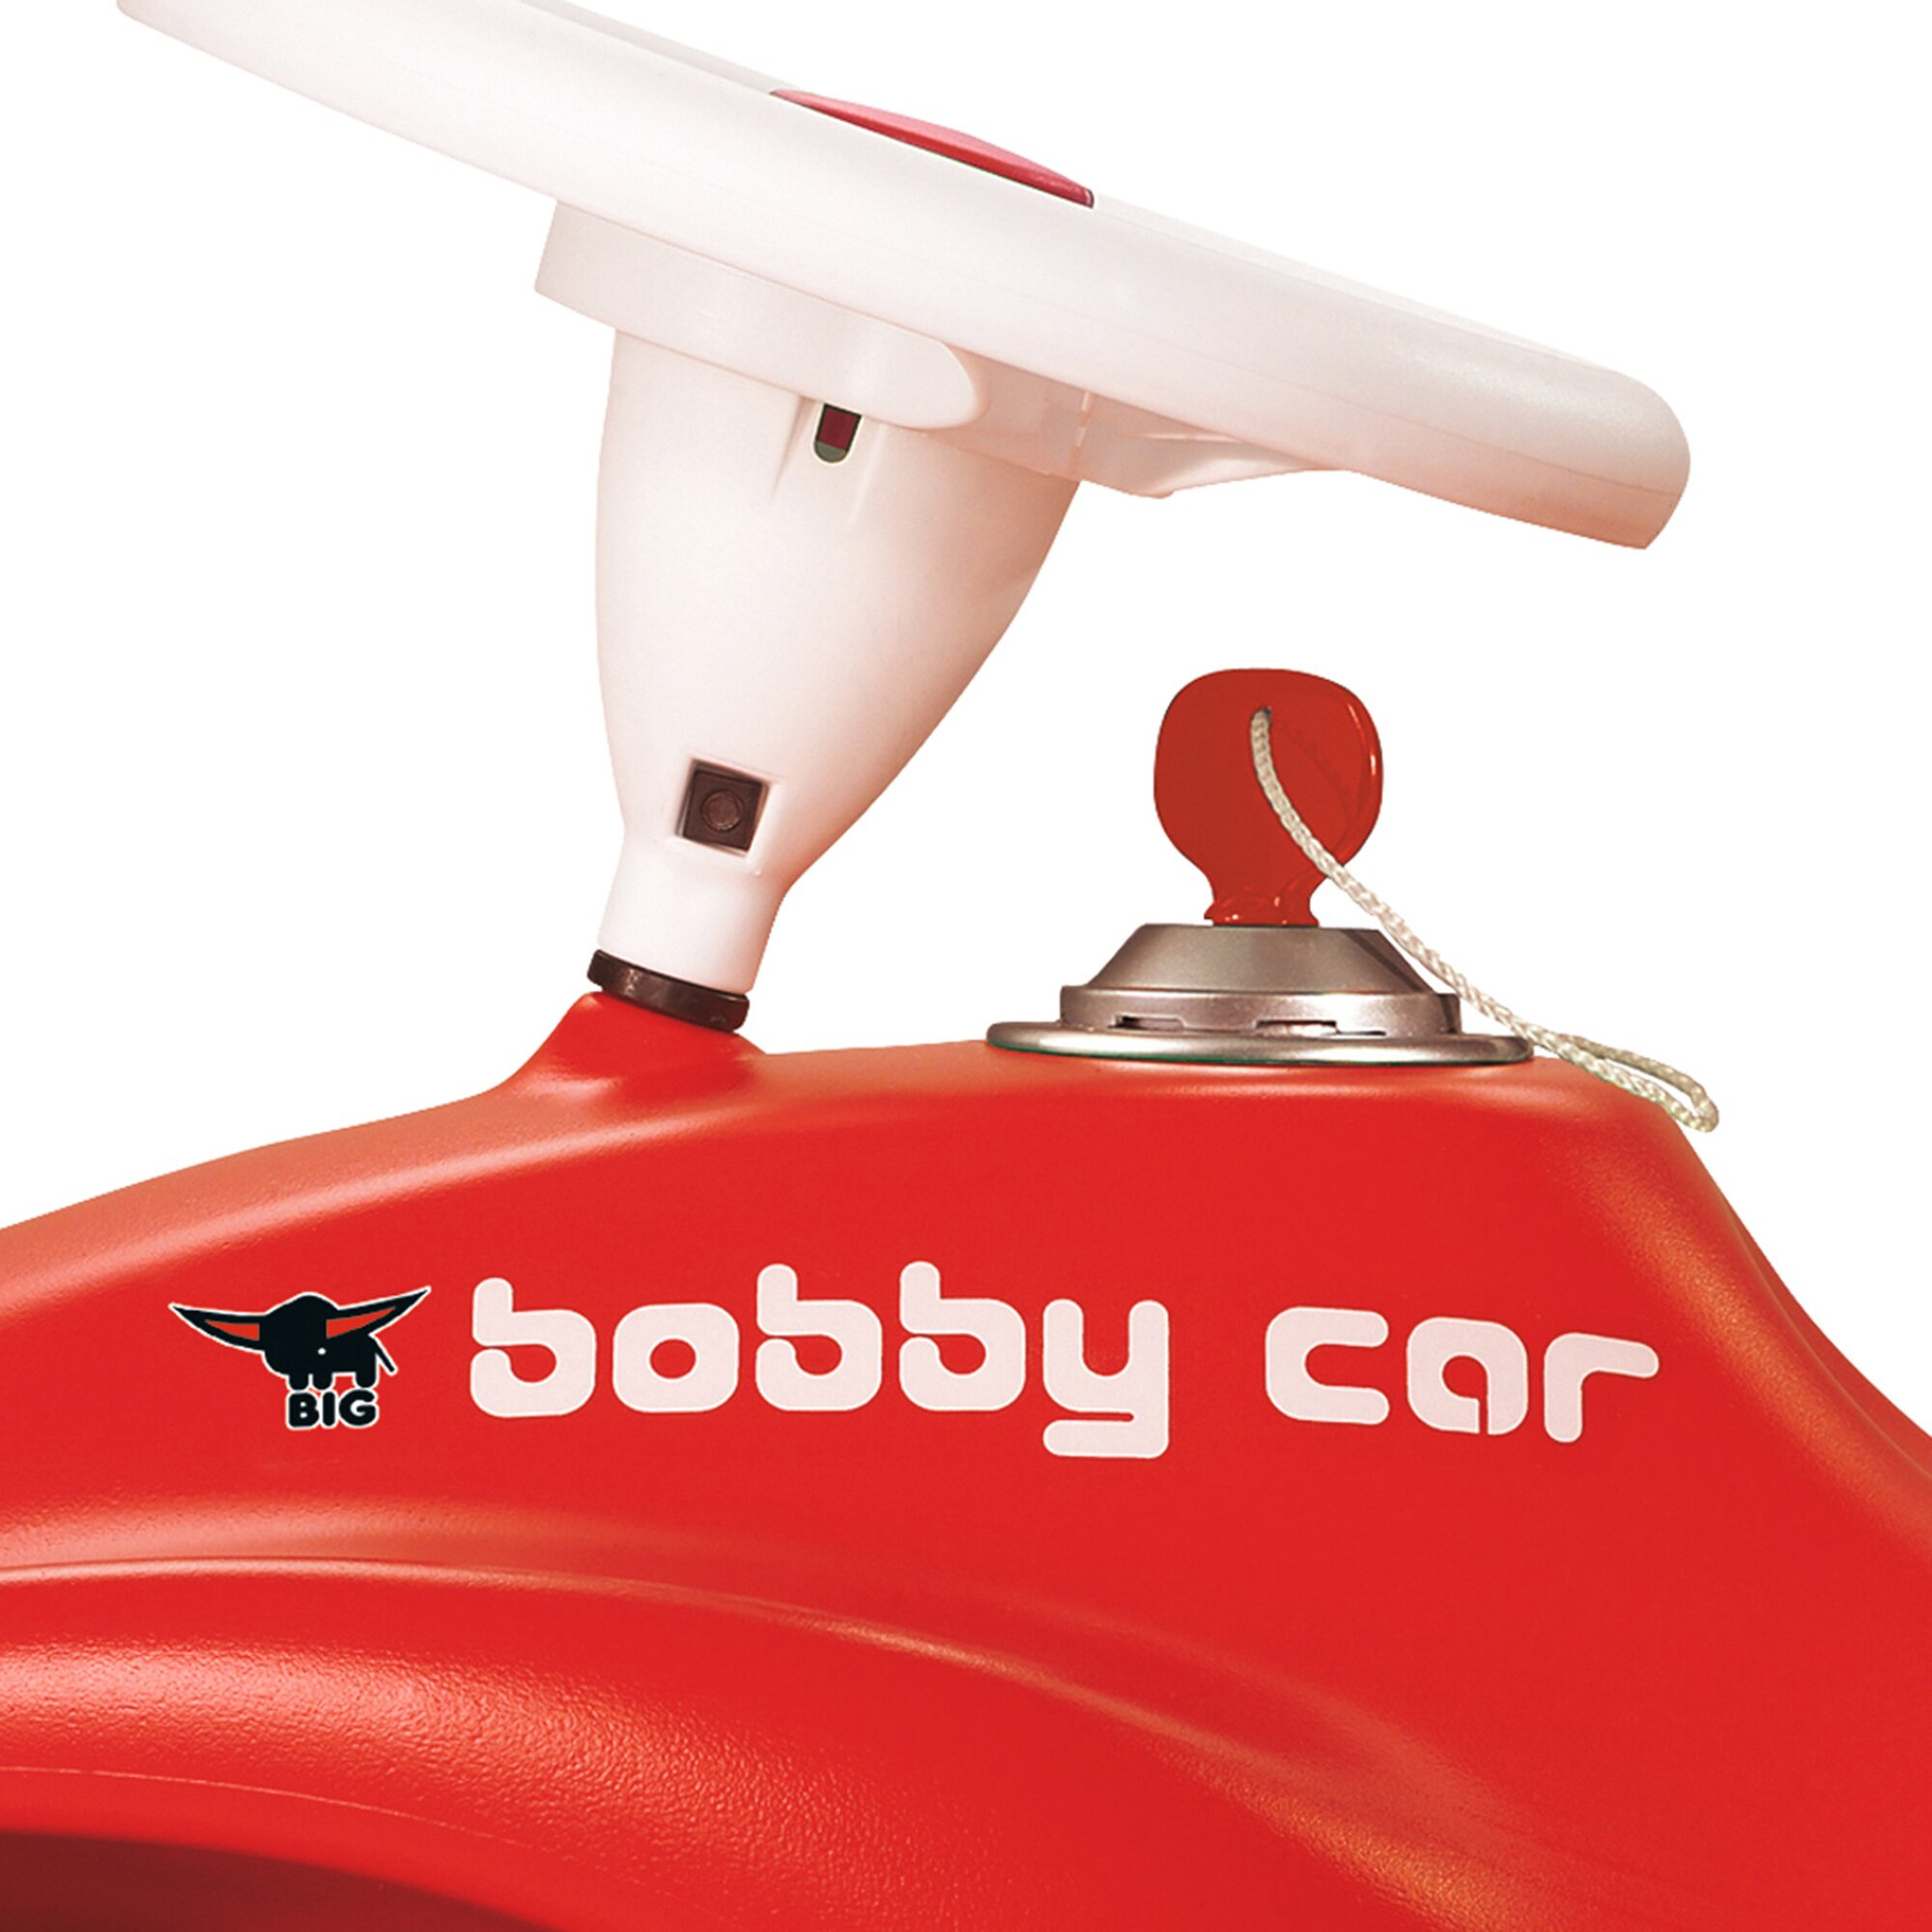 big-sound-starter-fur-new-bobby-car